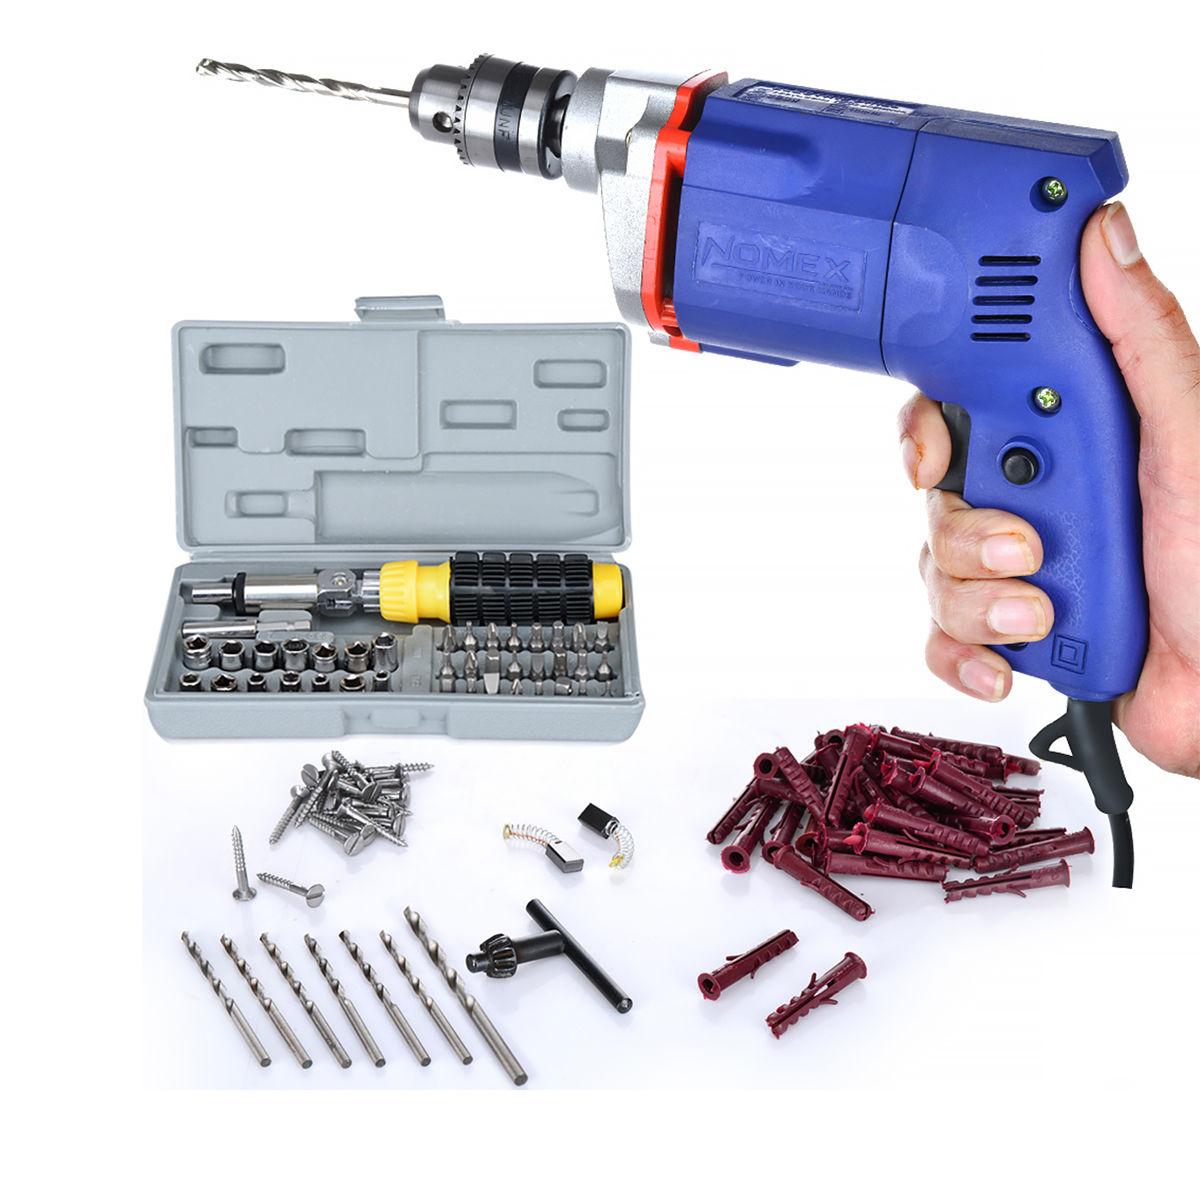 Buy 112 Pcs Drill Machine & Screwdriver Set Combo Online ...